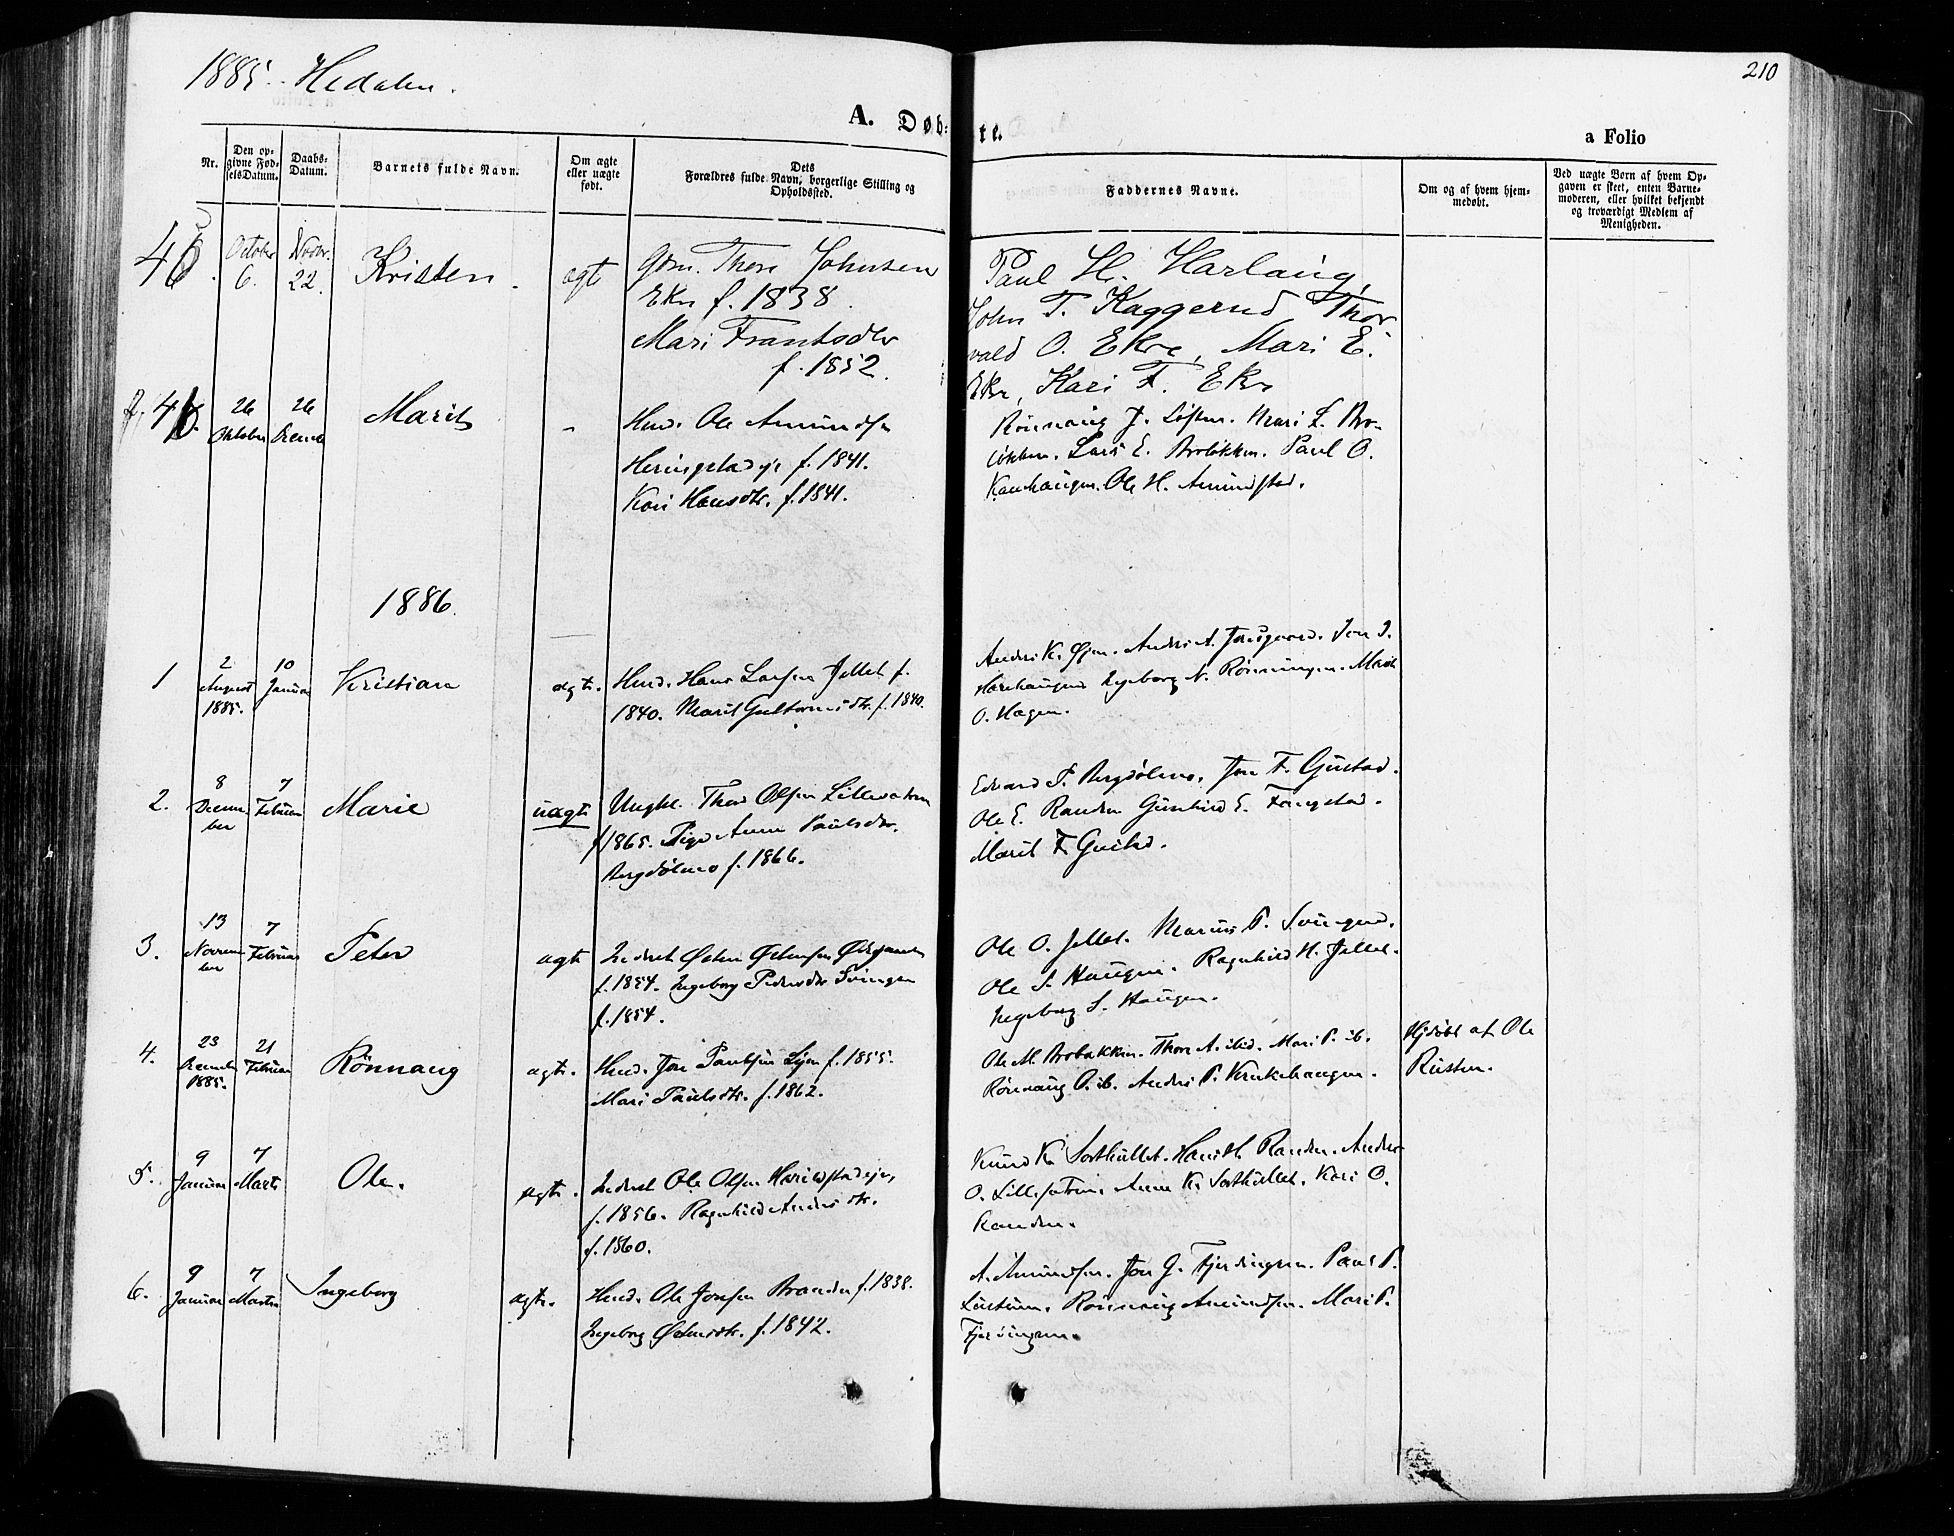 SAH, Vågå prestekontor, Ministerialbok nr. 7 /2, 1873-1886, s. 210